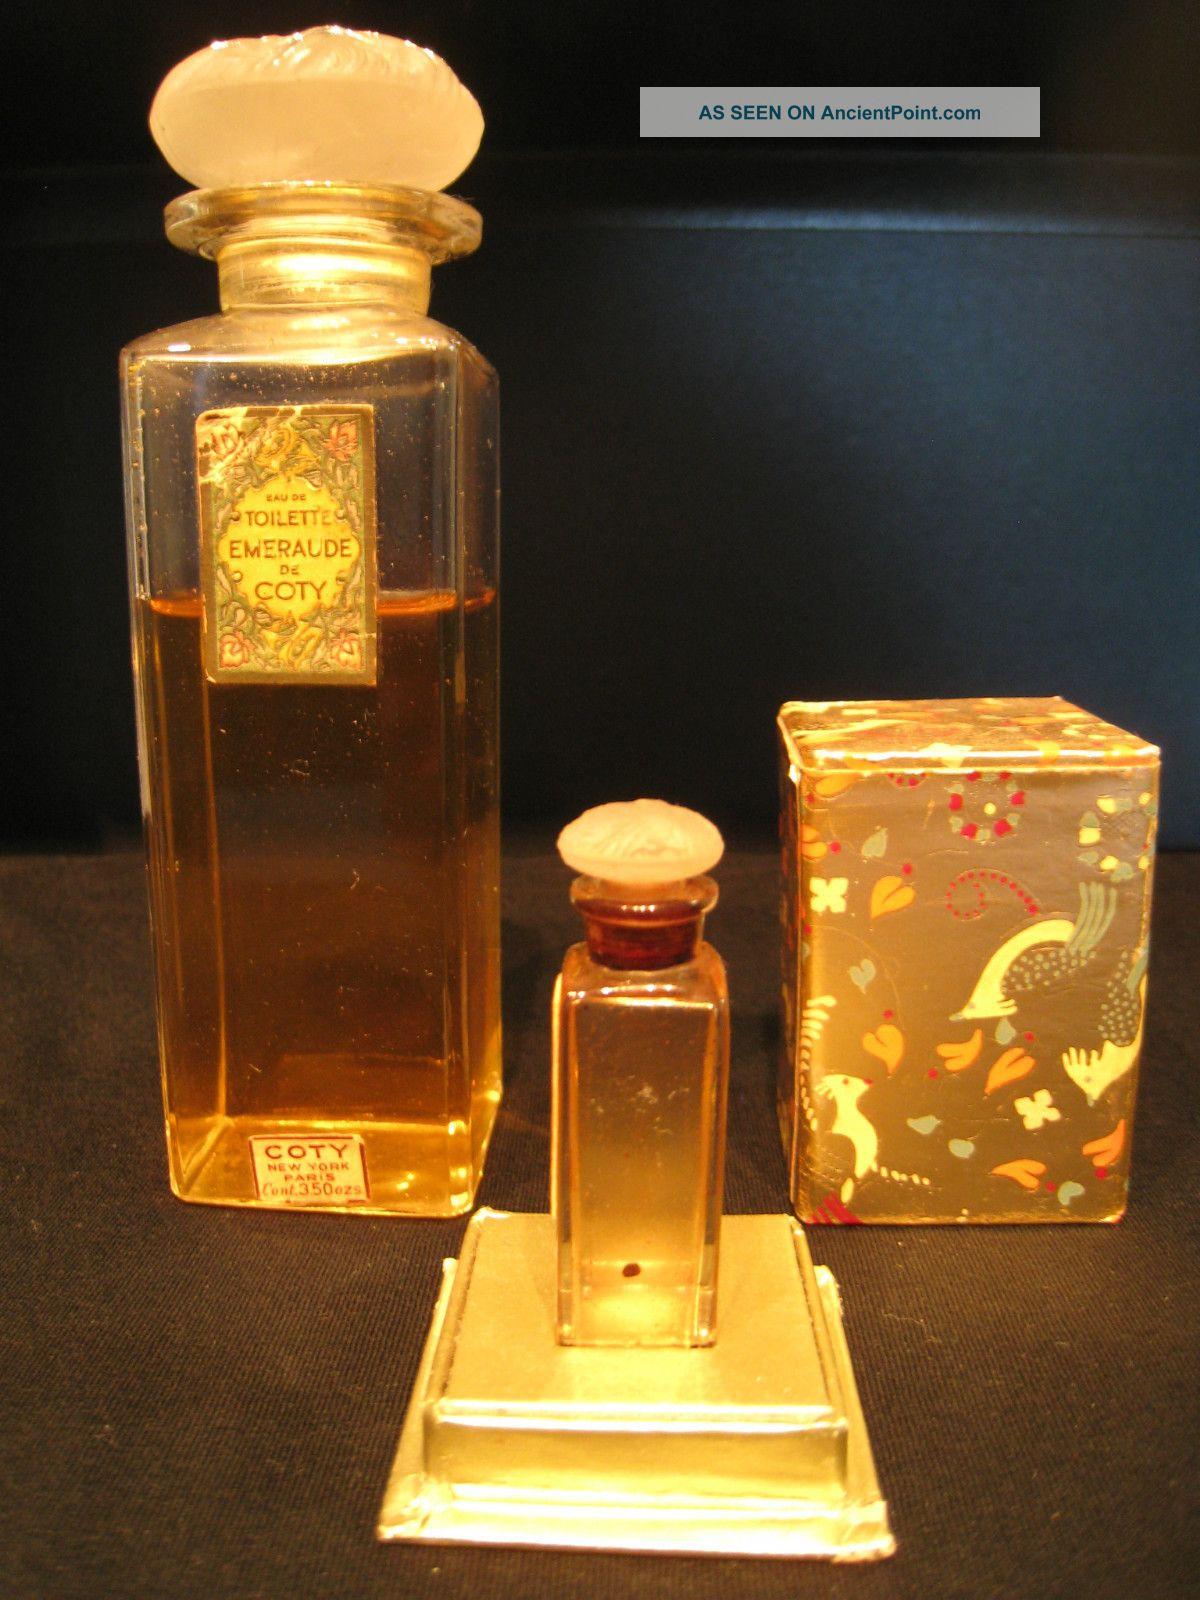 2 Rare Gorgeous Lalique Vintage Perfume Bottles C1930 Coty Emeraude & Miniature Perfume Bottles photo